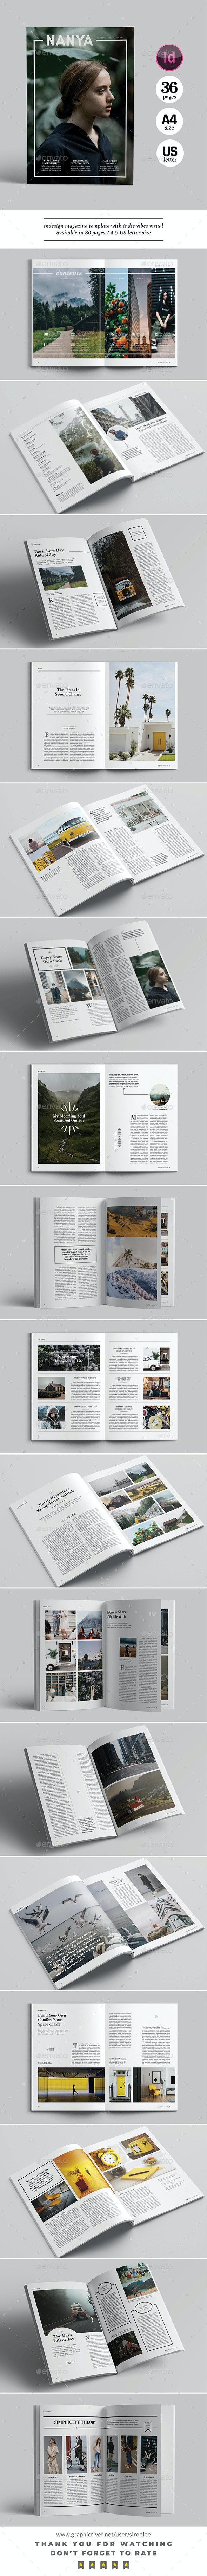 Indie Vibes Magazine - Magazines Print Templates